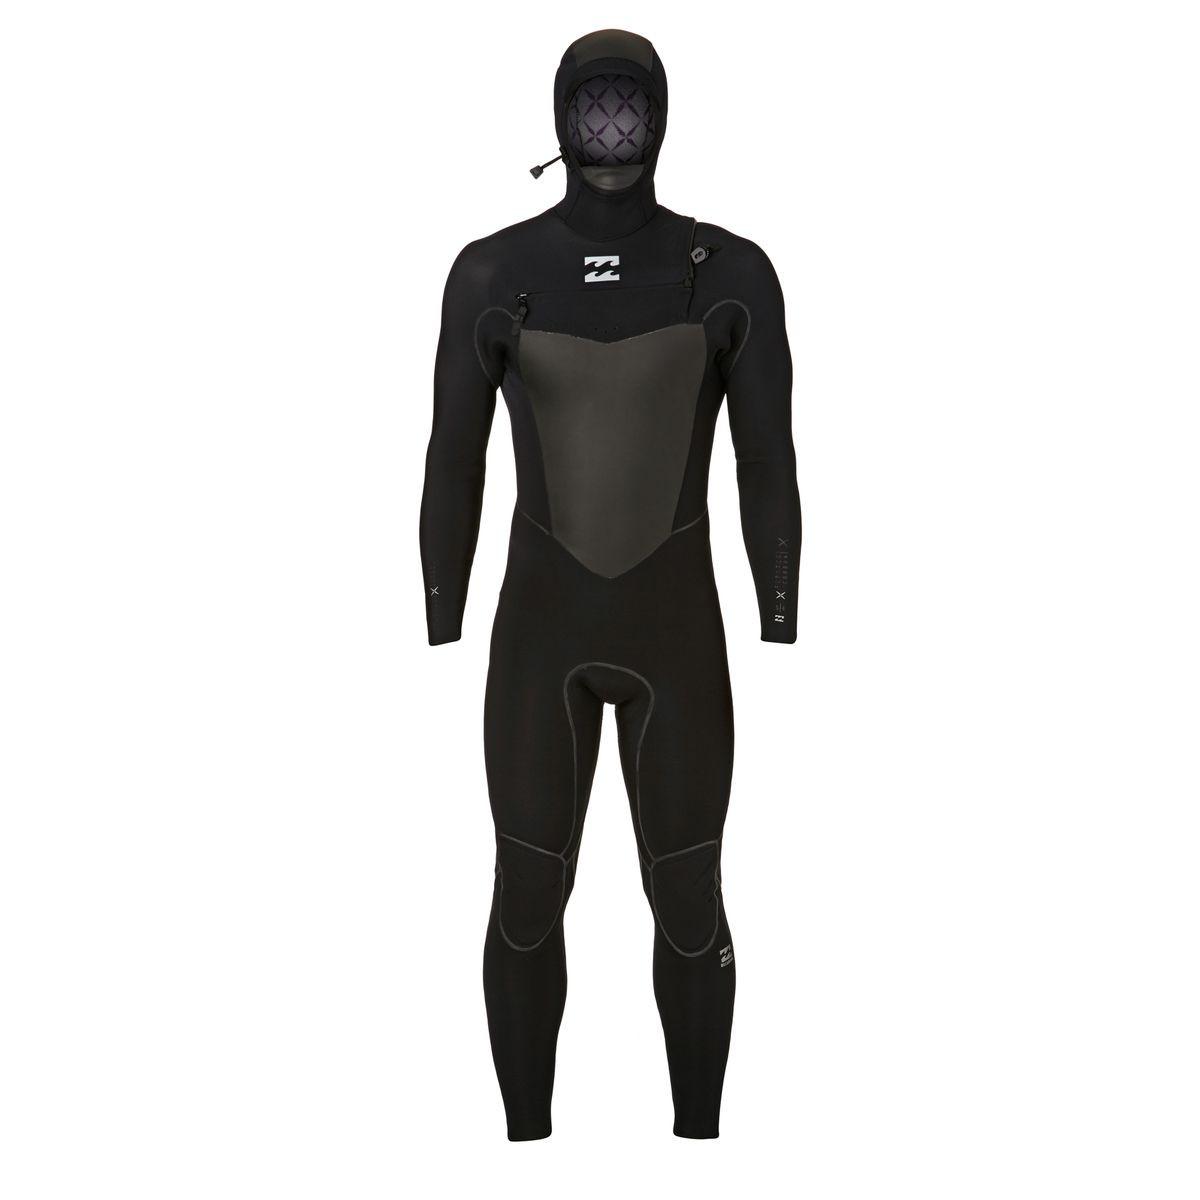 Billabong Furnace Carbon X 5/4mm 2018 Hooded Chest Zip Wetsuit - Black